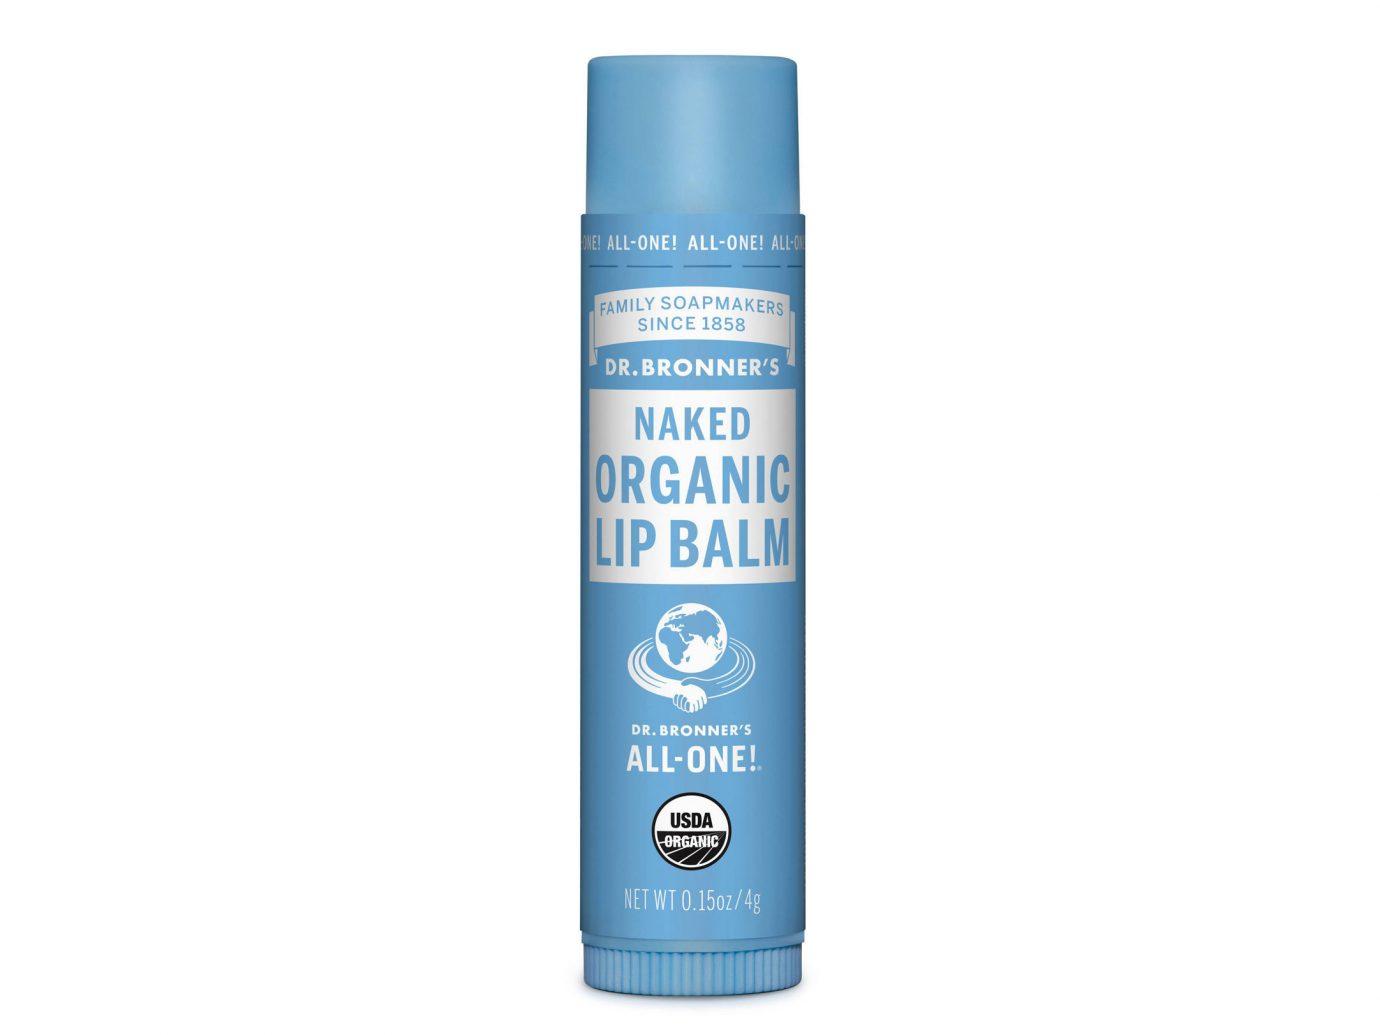 Style + Design Travel Shop Travel Tech Travel Tips product toiletry spray lotion liquid deodorant